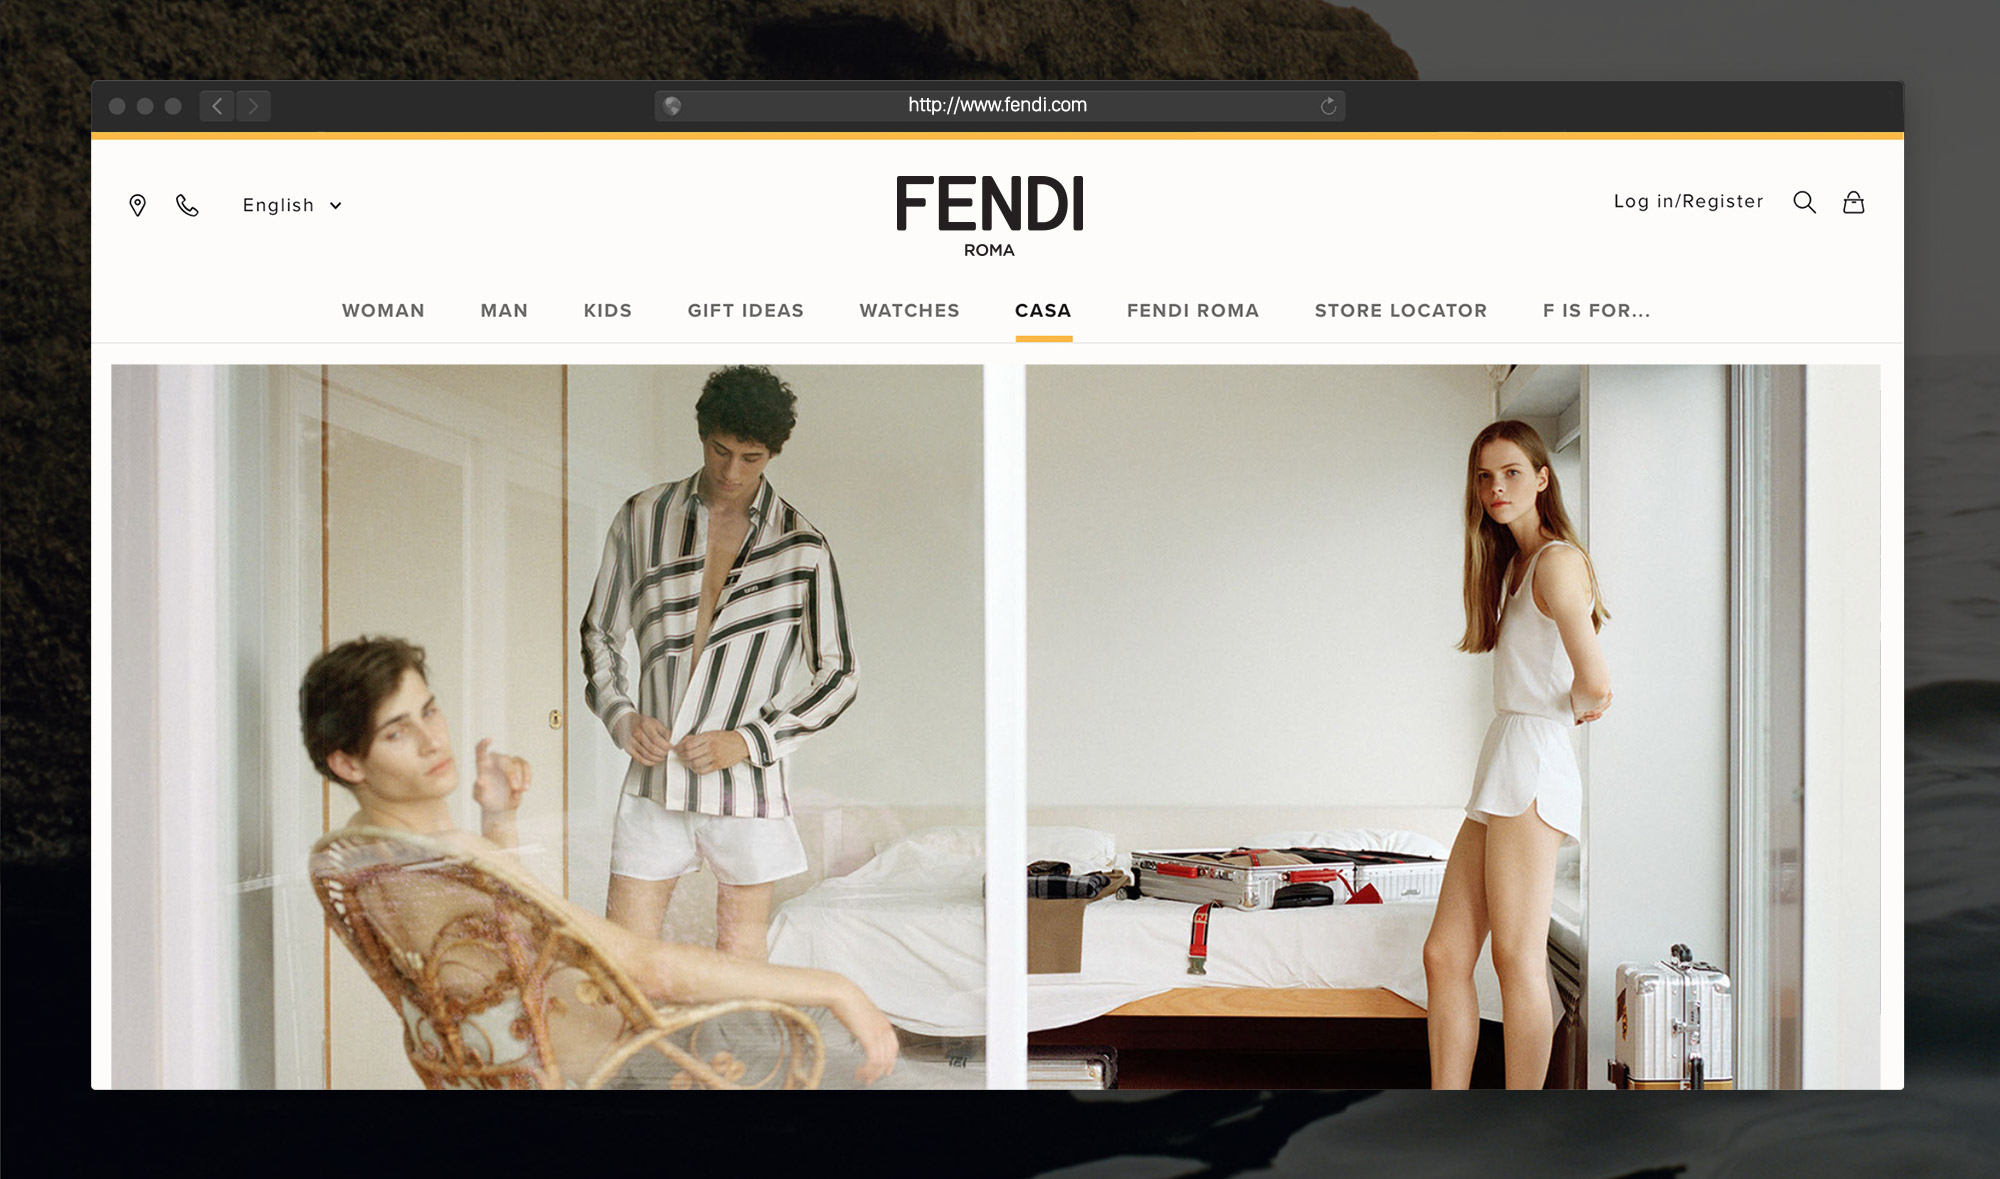 Fendi Identity Design as it Appears on Fendi.com